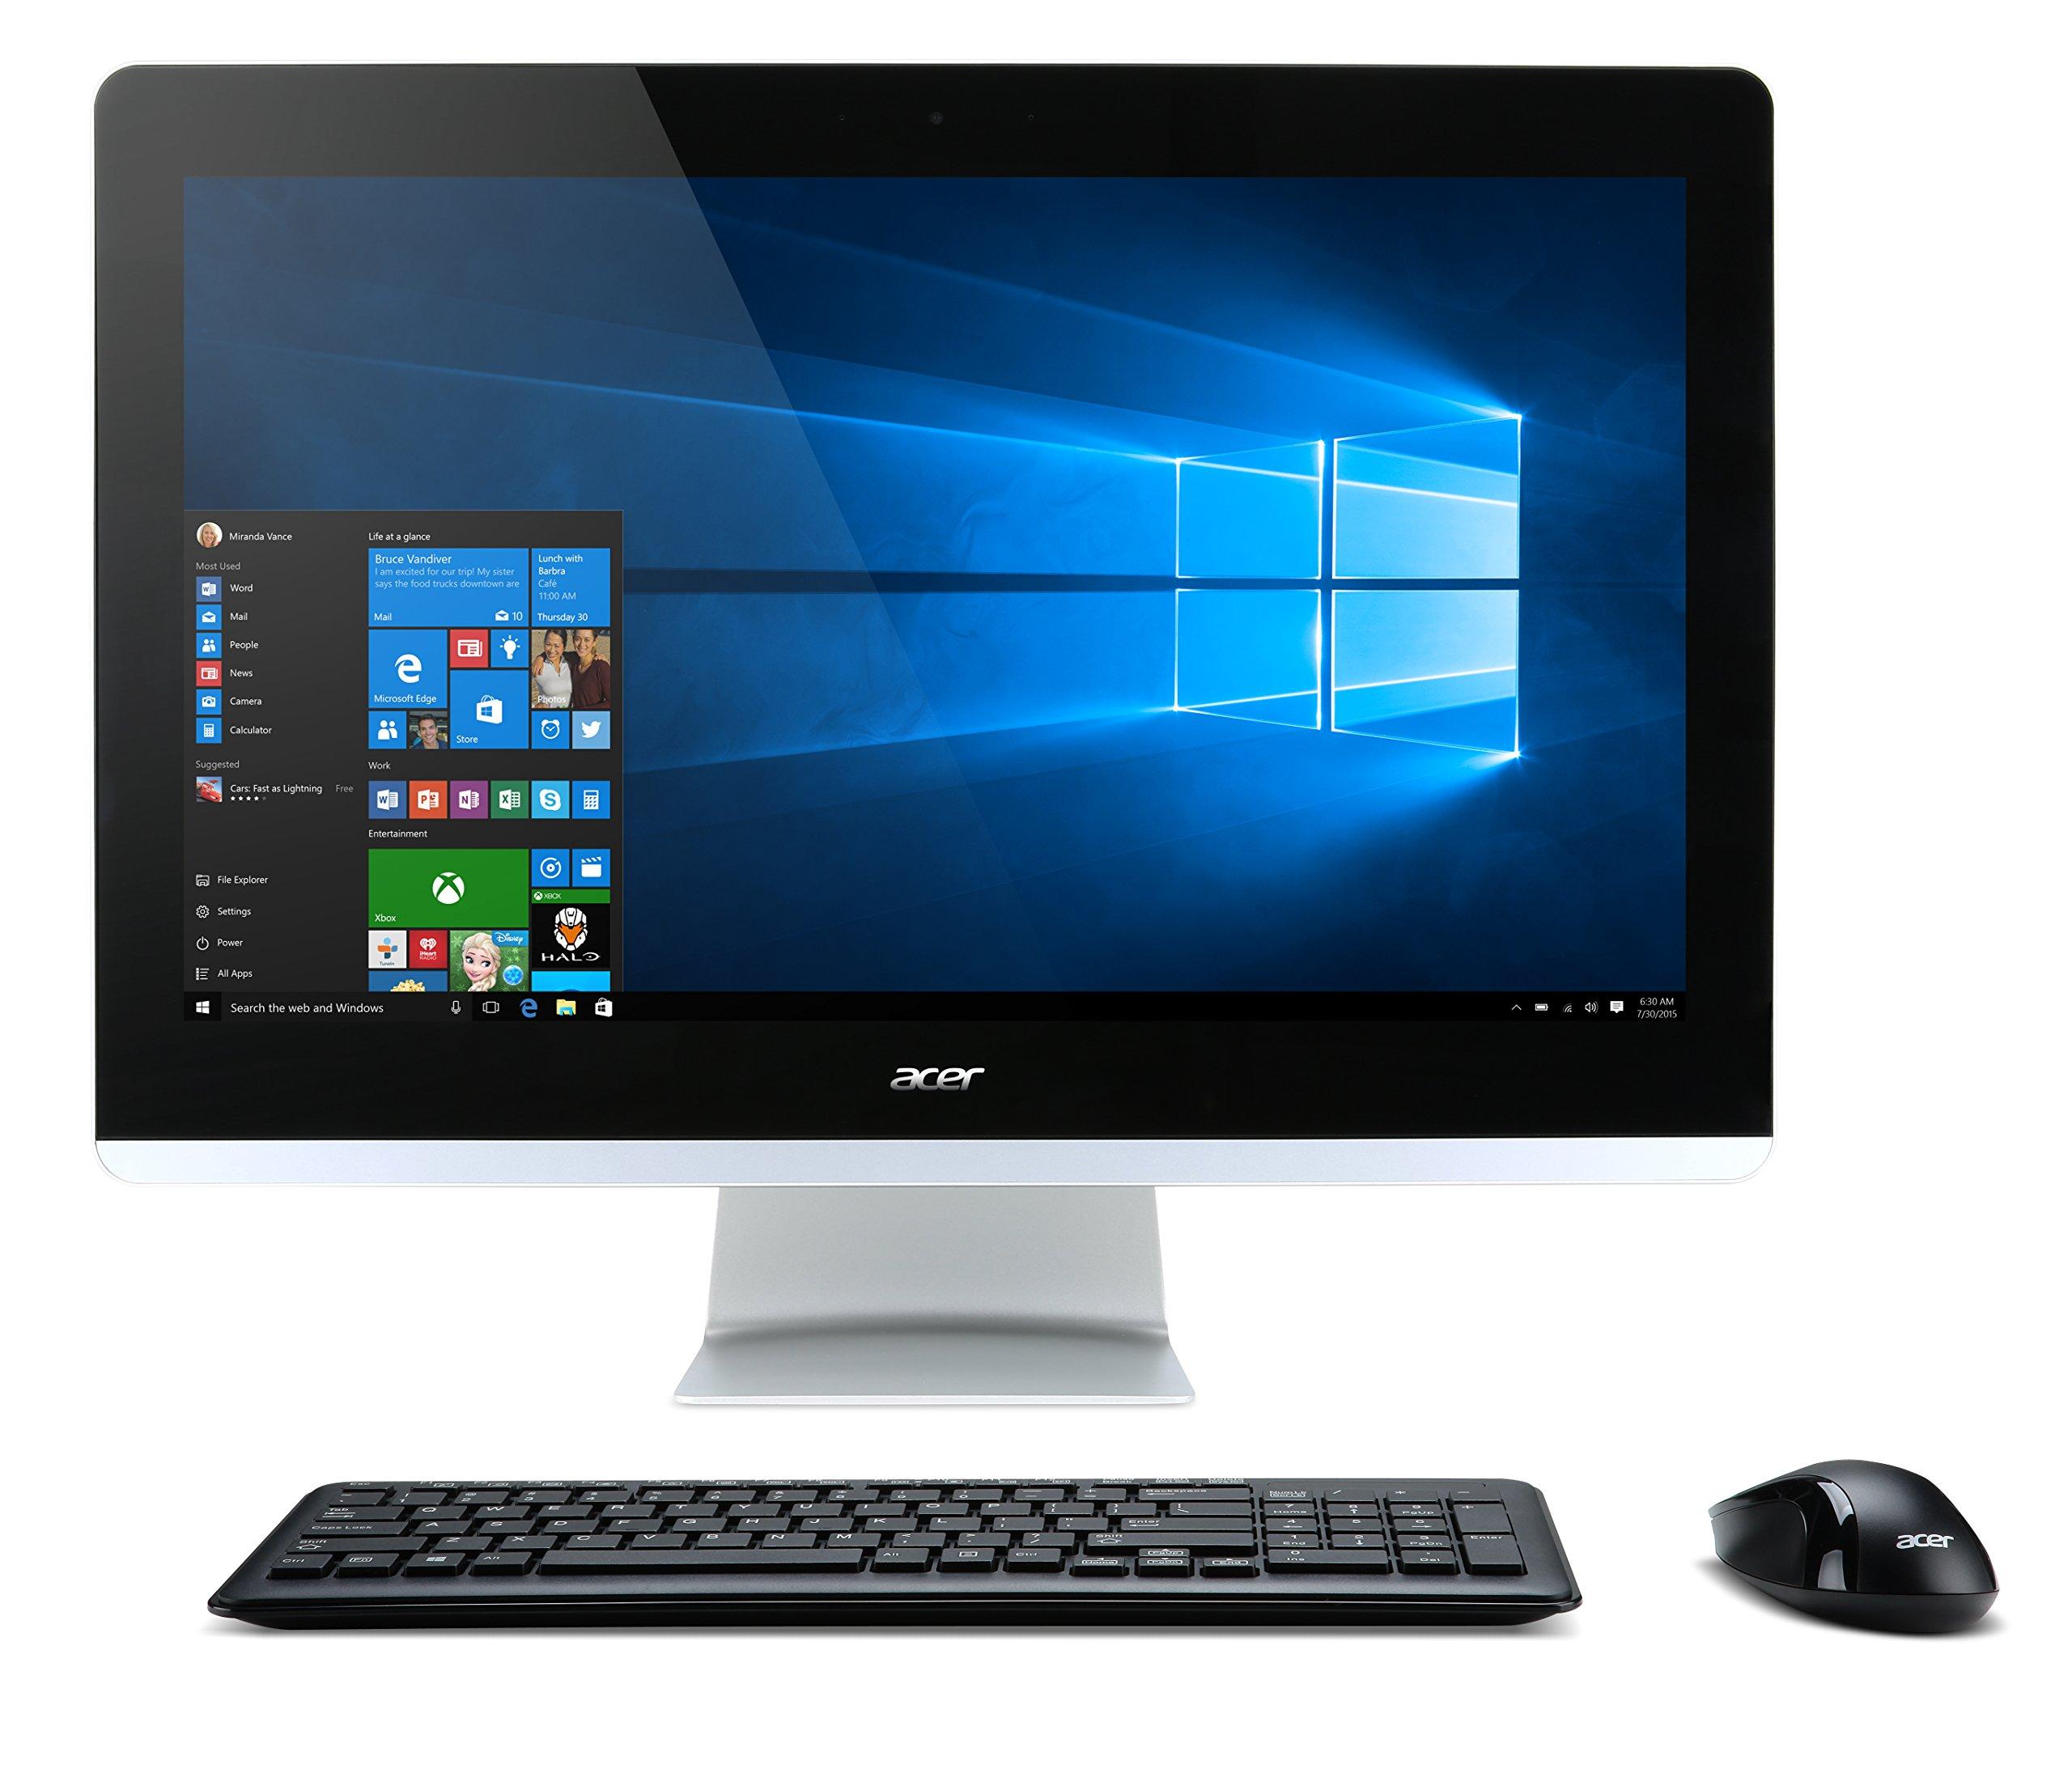 "Acer Aspire AIO Desktop, 23.8"" Full HD, Core i5-6400T, NVIDIA 940M 2GB Discrete Graphics Card, 8GB DDR4, 1TB HDD, Win 10, AZ3-715-UR61"